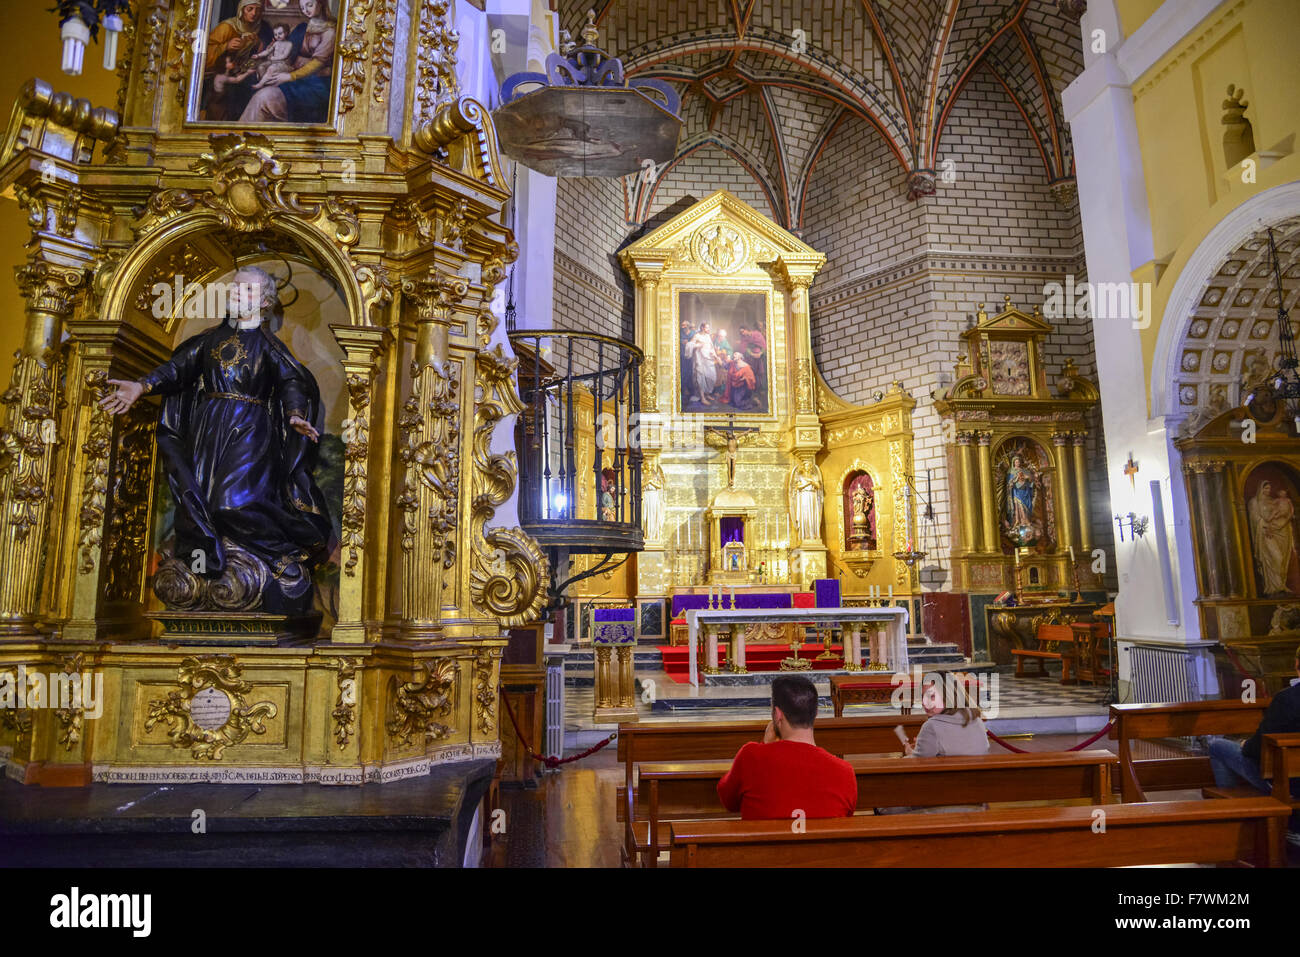 Interior of Iglesia de Santo Tome, Toledo, Spain Stock ...